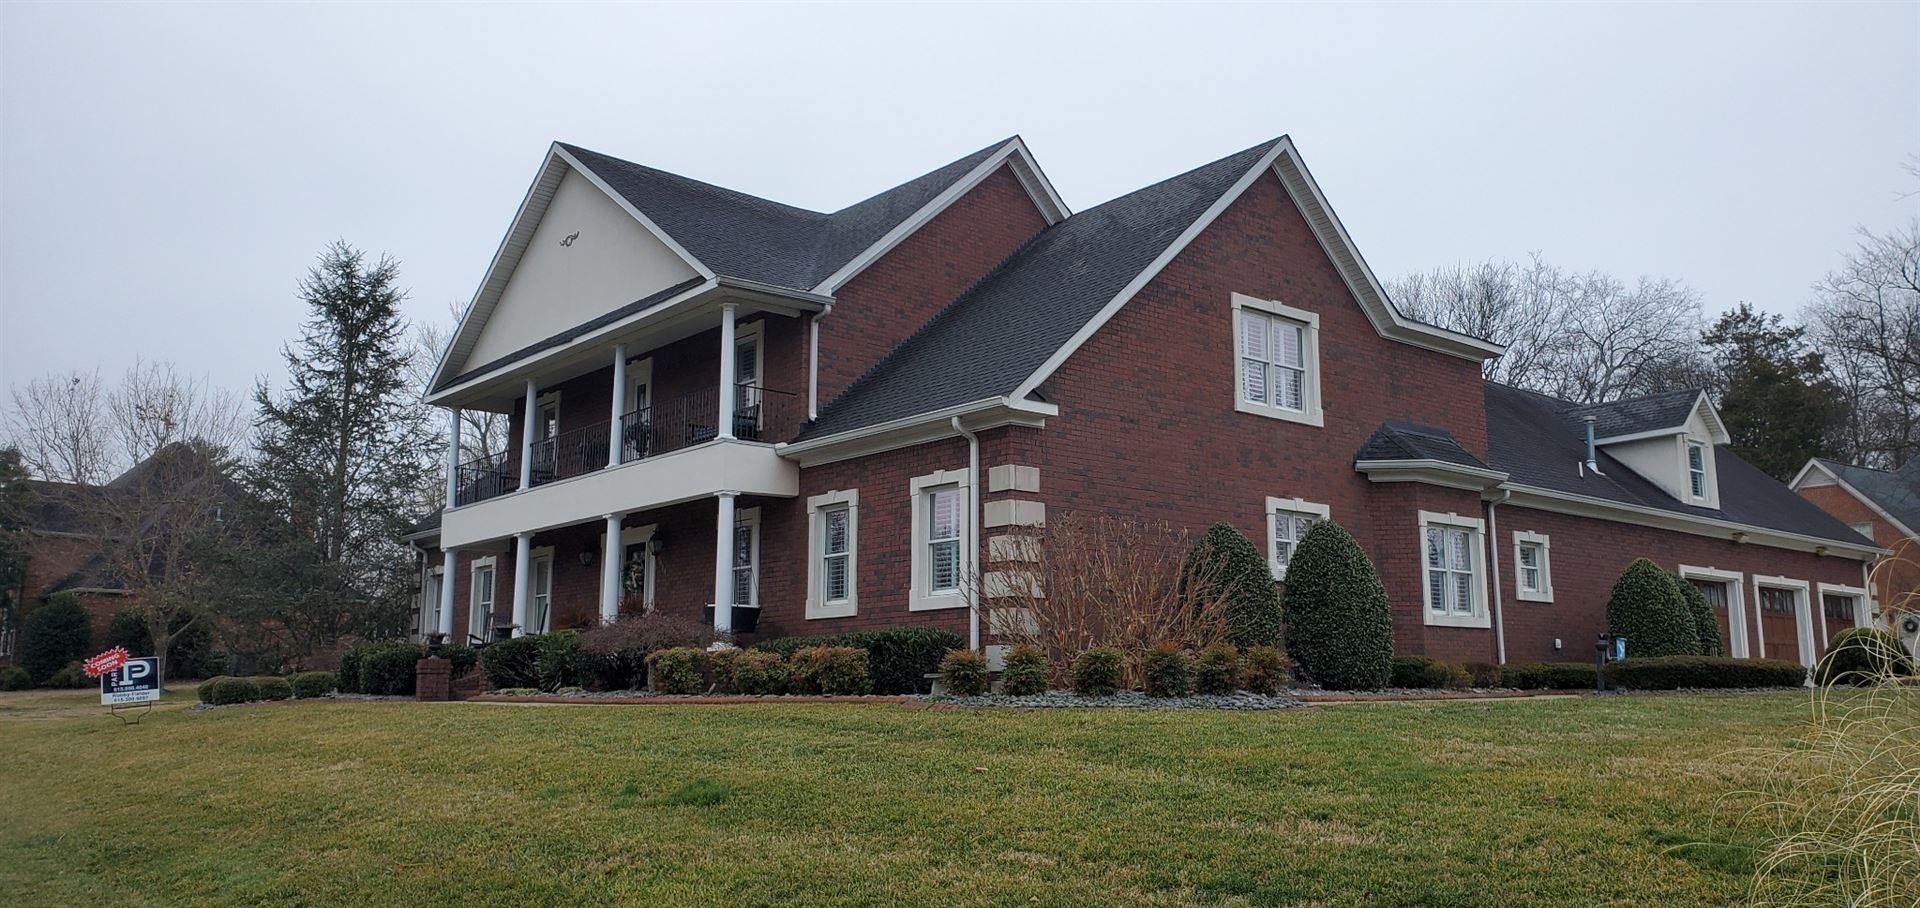 Photo of 3021 Saint Johns Drive, Murfreesboro, TN 37129 (MLS # 2228620)